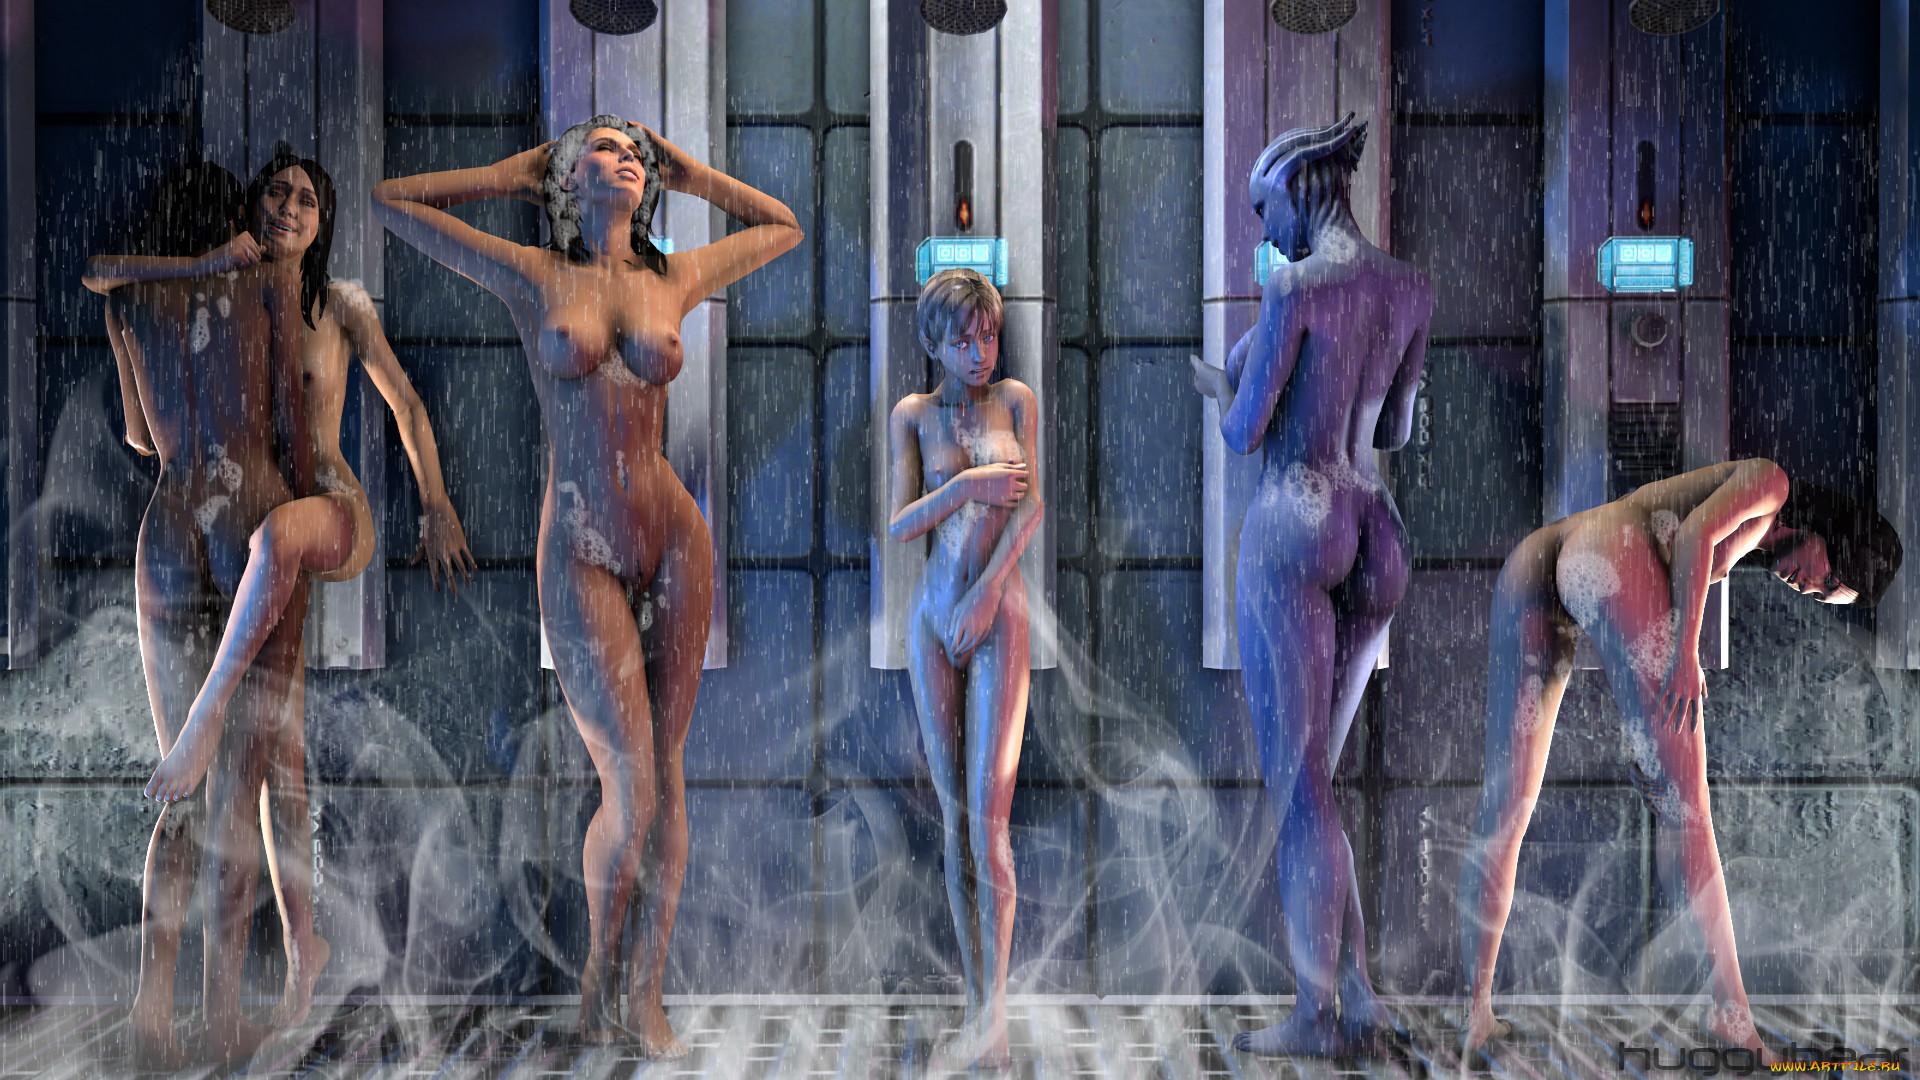 Naked mass picture, biker beauties nude pics